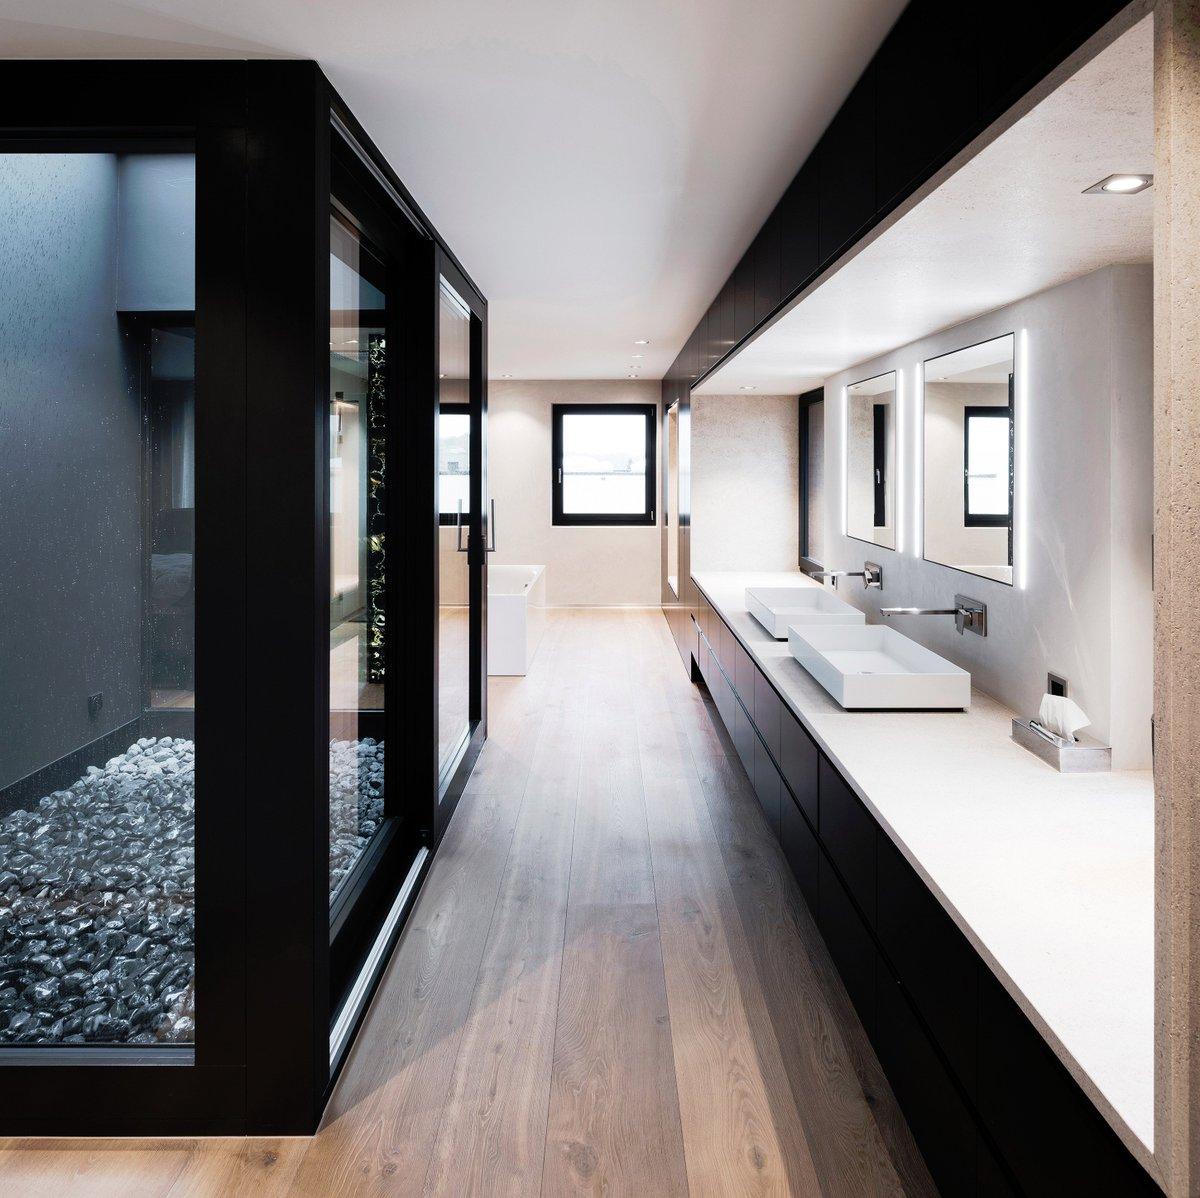 Emwe architektur emwearchitektur twitter for Badezimmer jona